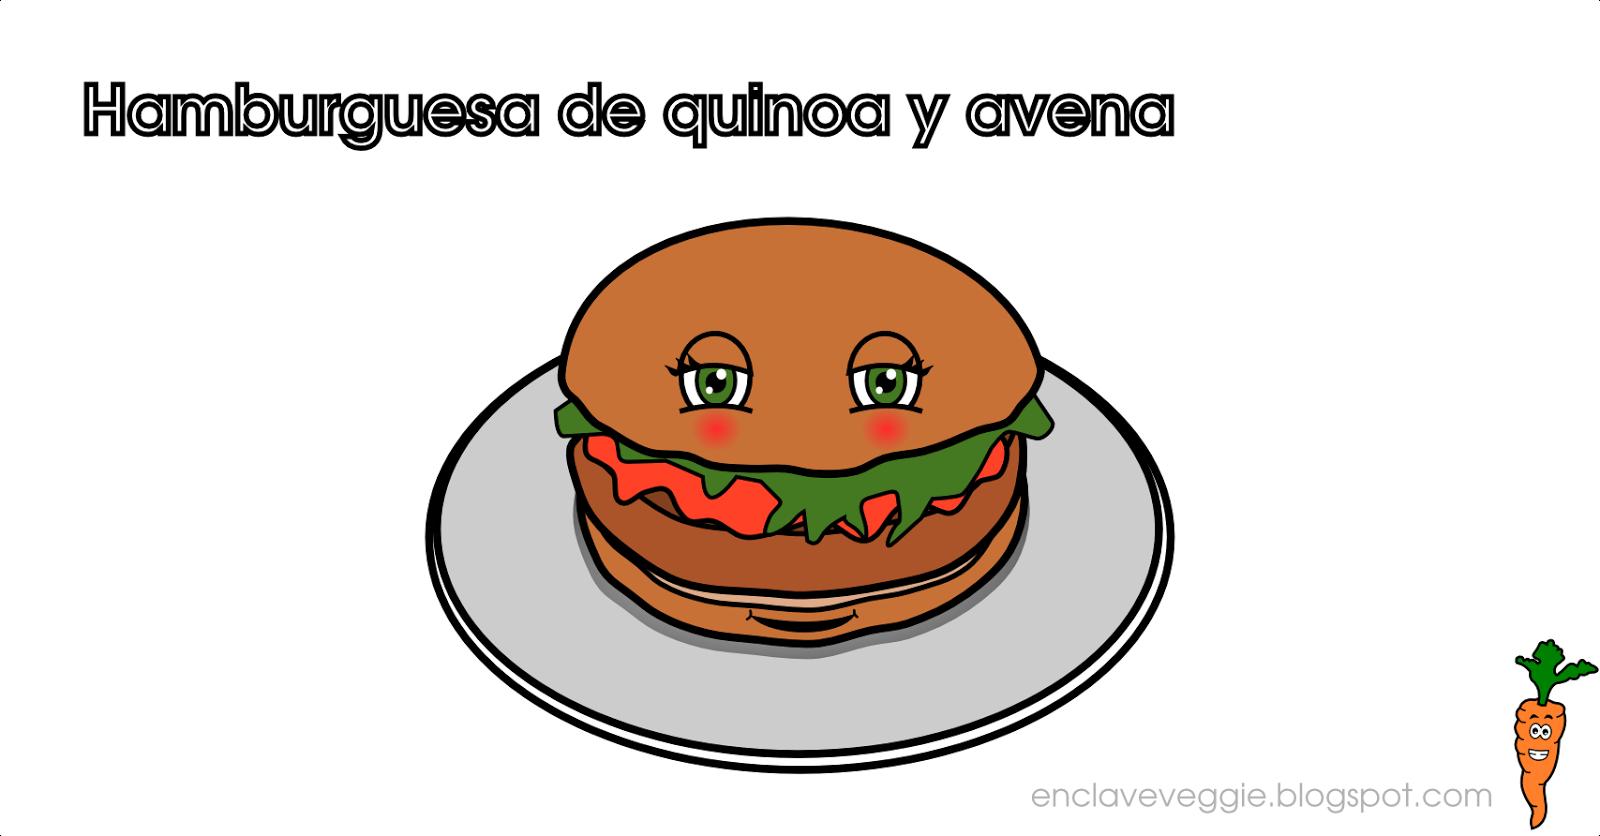 http://enclaveveggie.blogspot.com/2015/01/hamburguesas-de-quinoa-y-avena.html